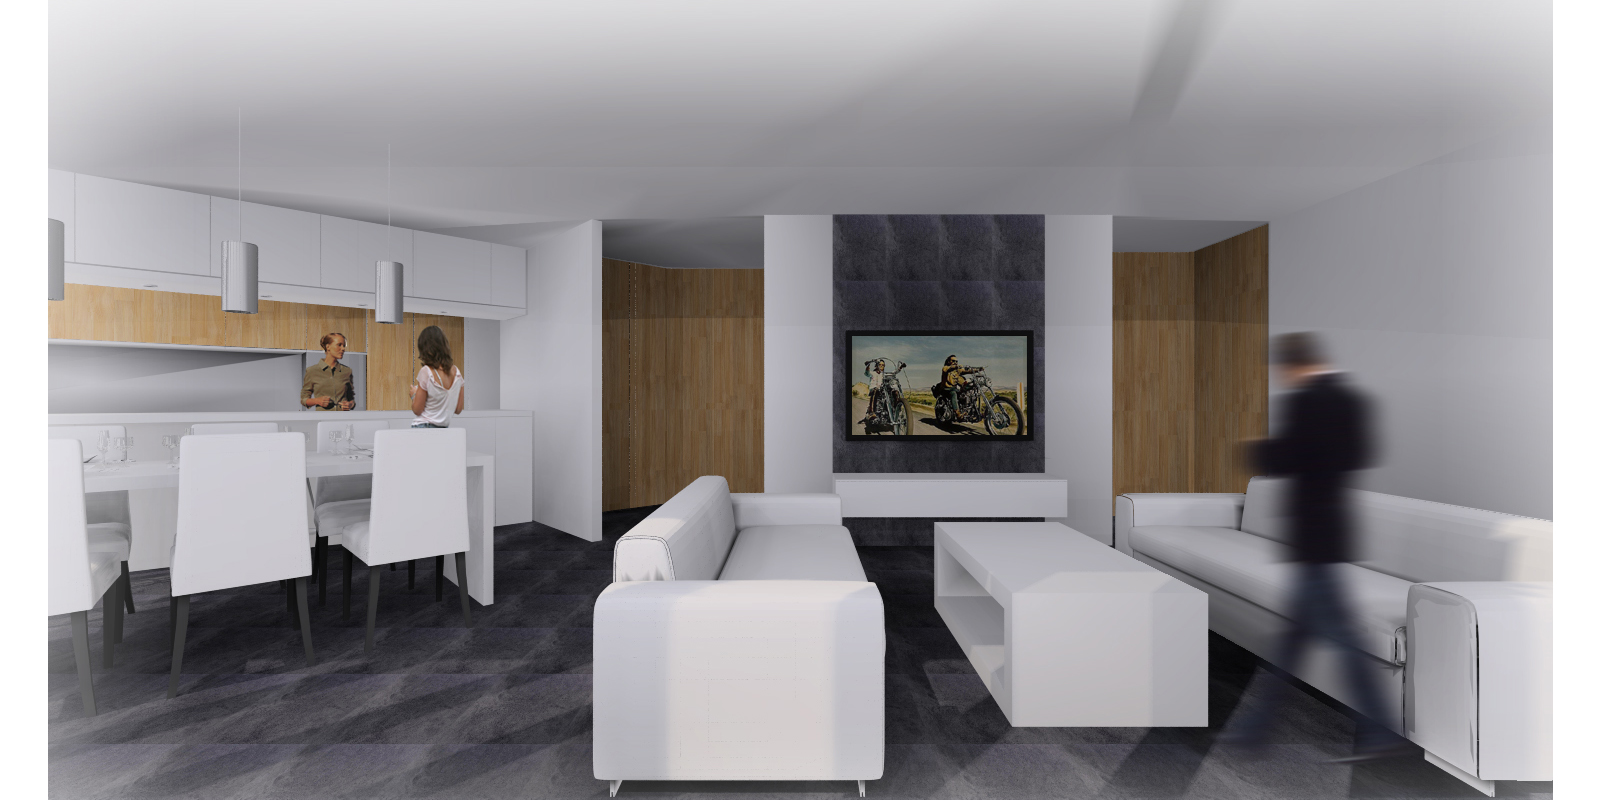 Apartamentosalon2